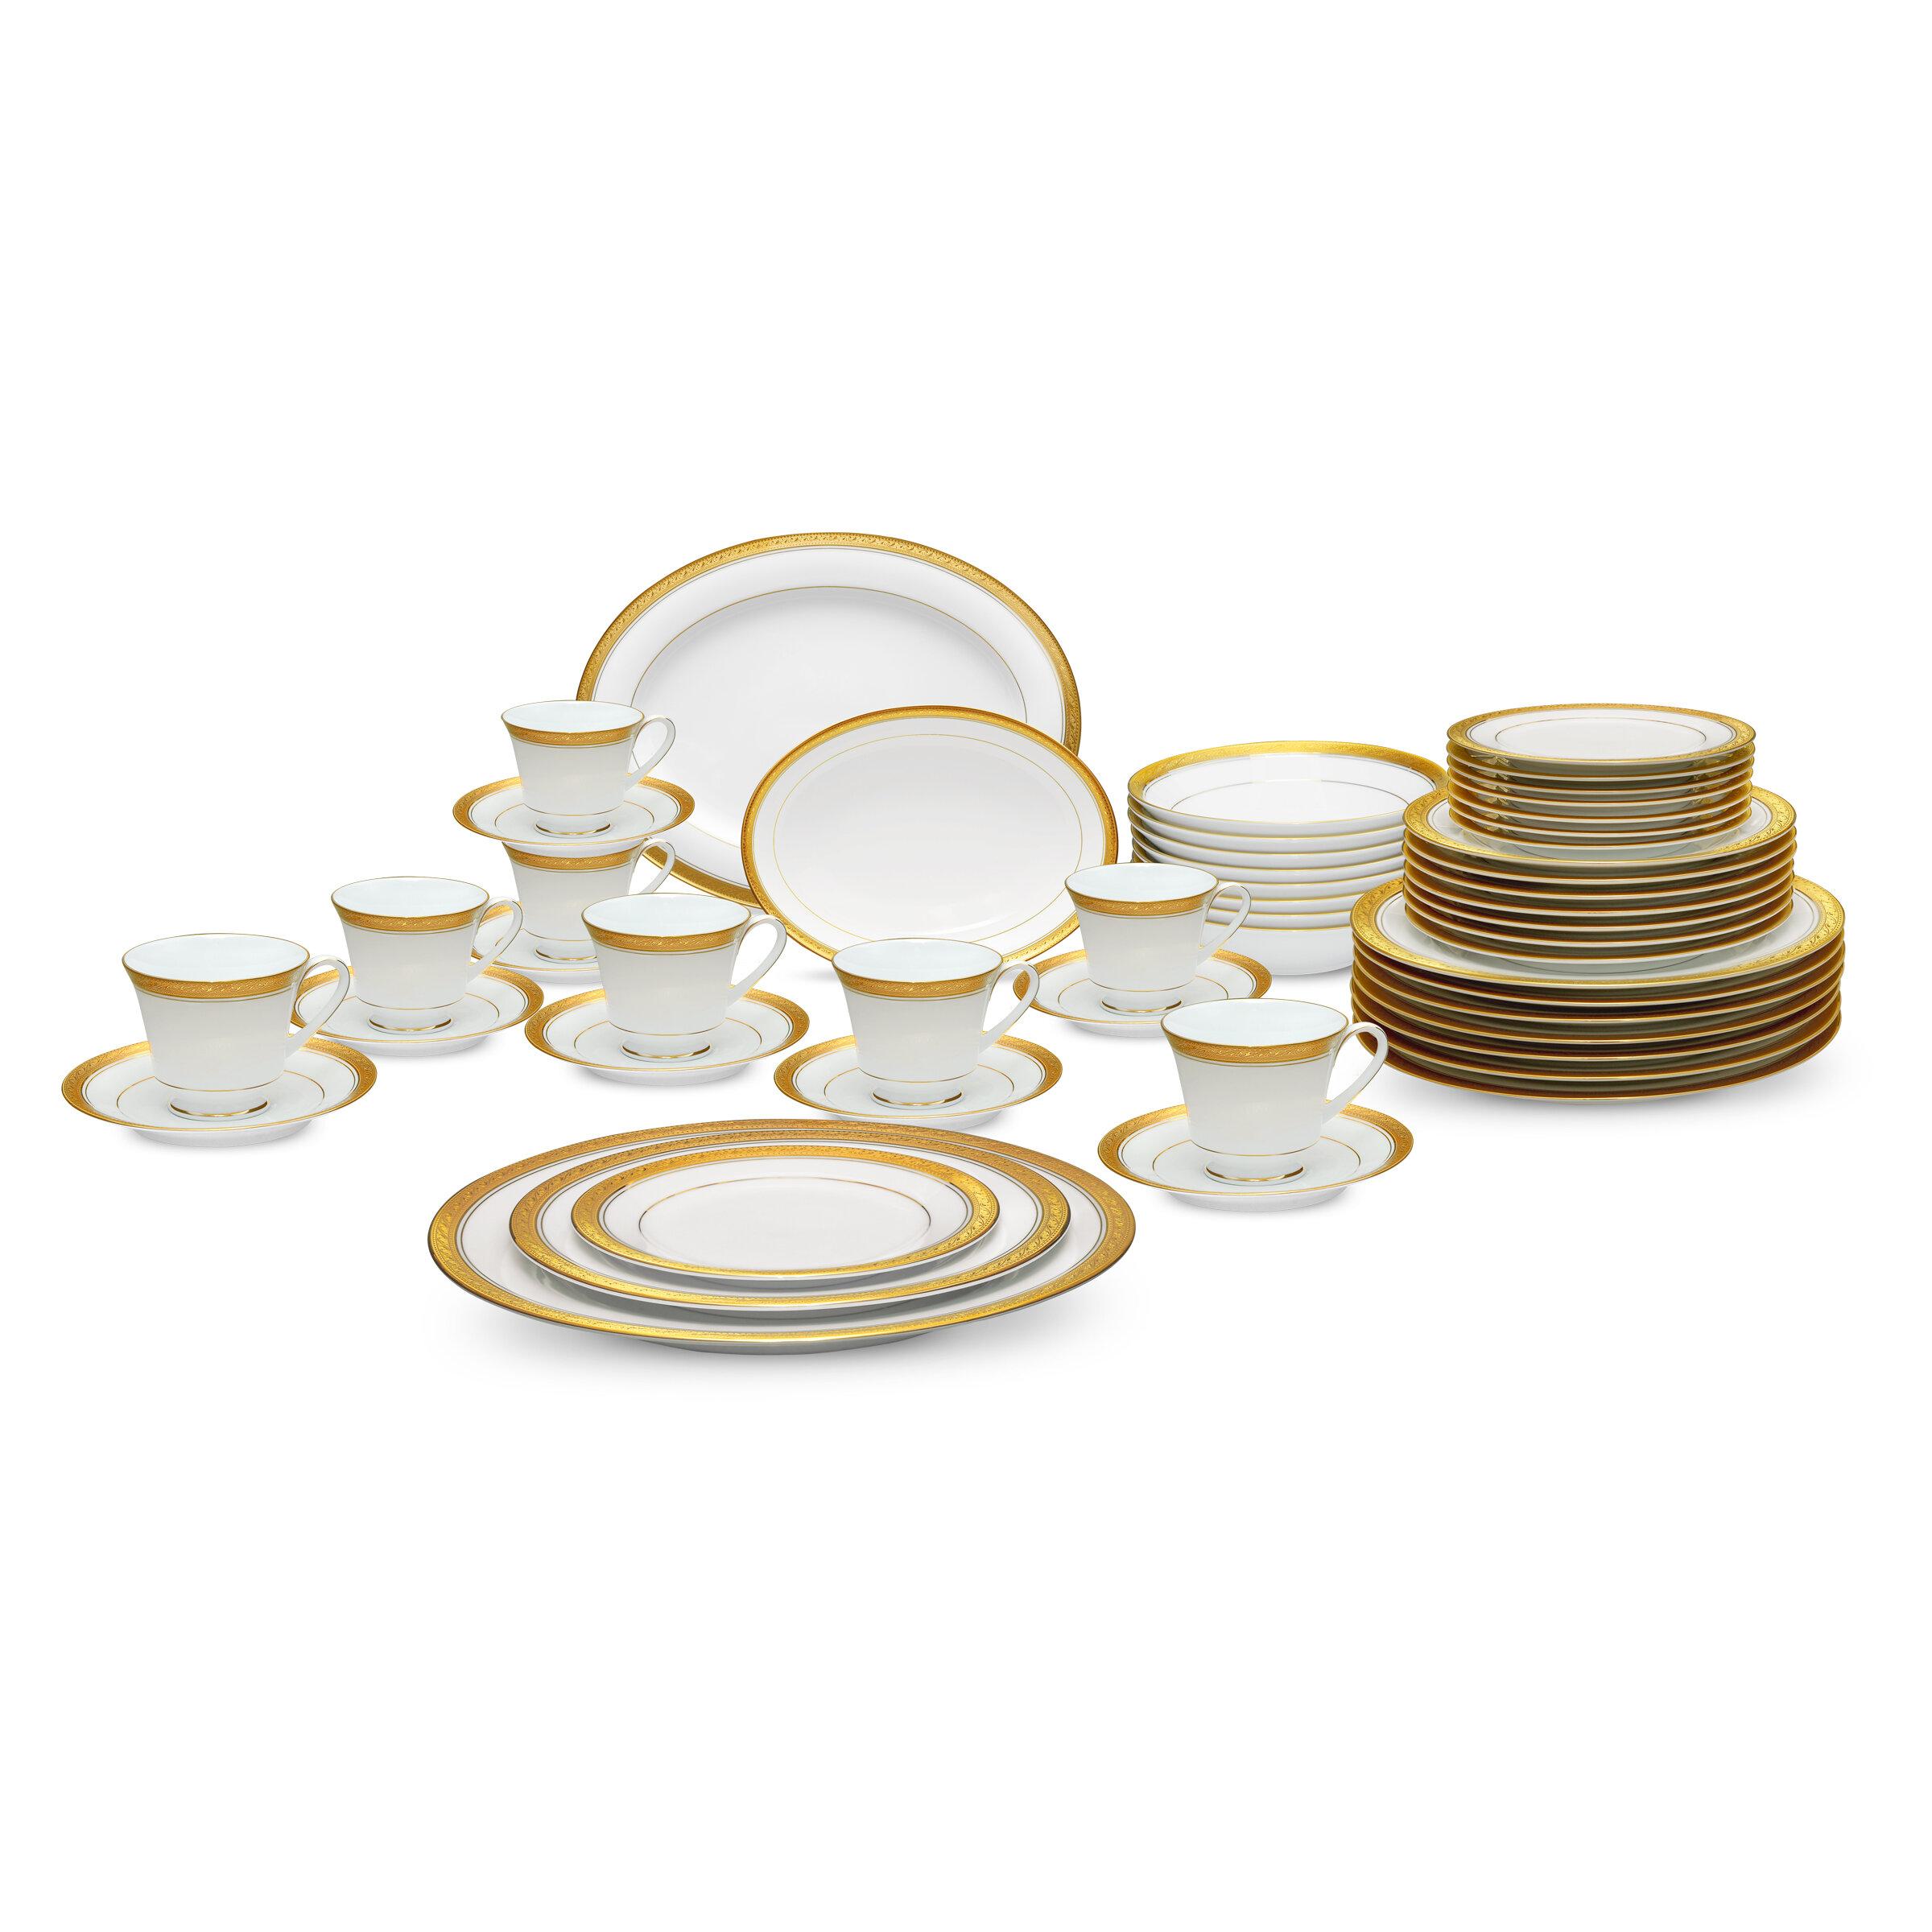 Noritake Crestwood Gold 50 Piece Dinnerware Set Service for 8 u0026 Reviews   Wayfair  sc 1 st  Wayfair & Noritake Crestwood Gold 50 Piece Dinnerware Set Service for 8 ...